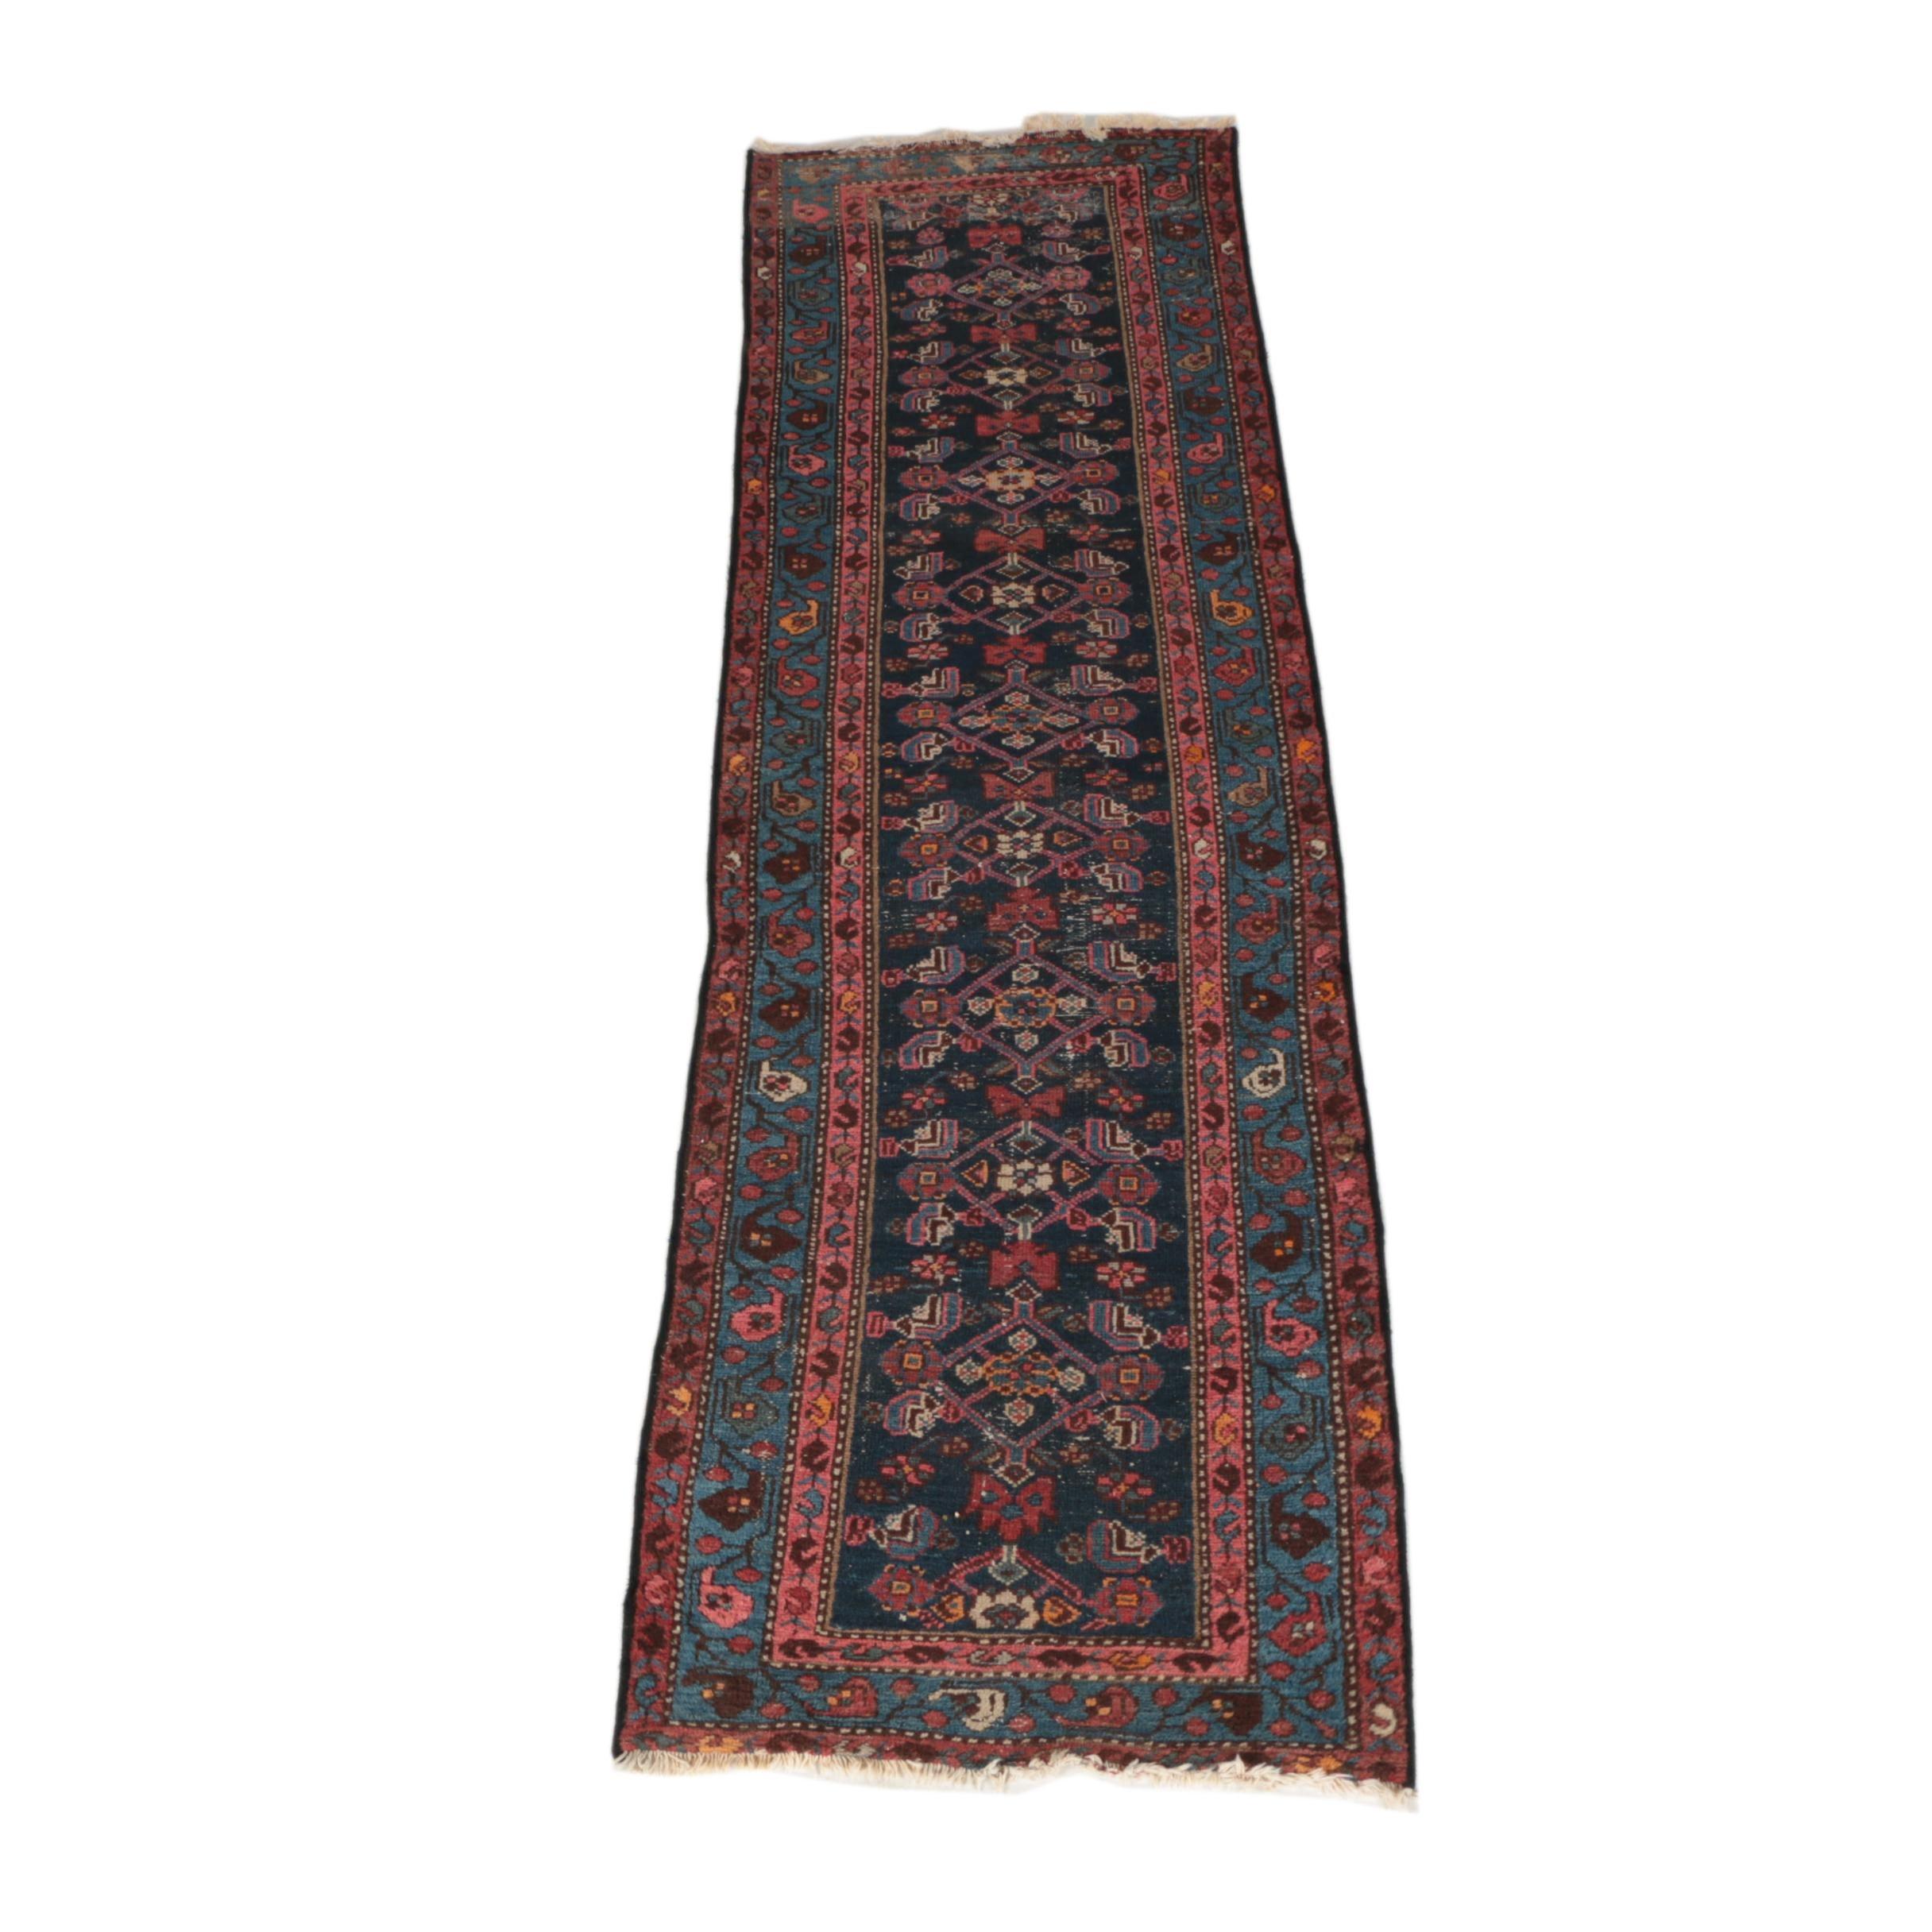 Semi-Antique Hand-Knotted Hamadan Carpet Runner